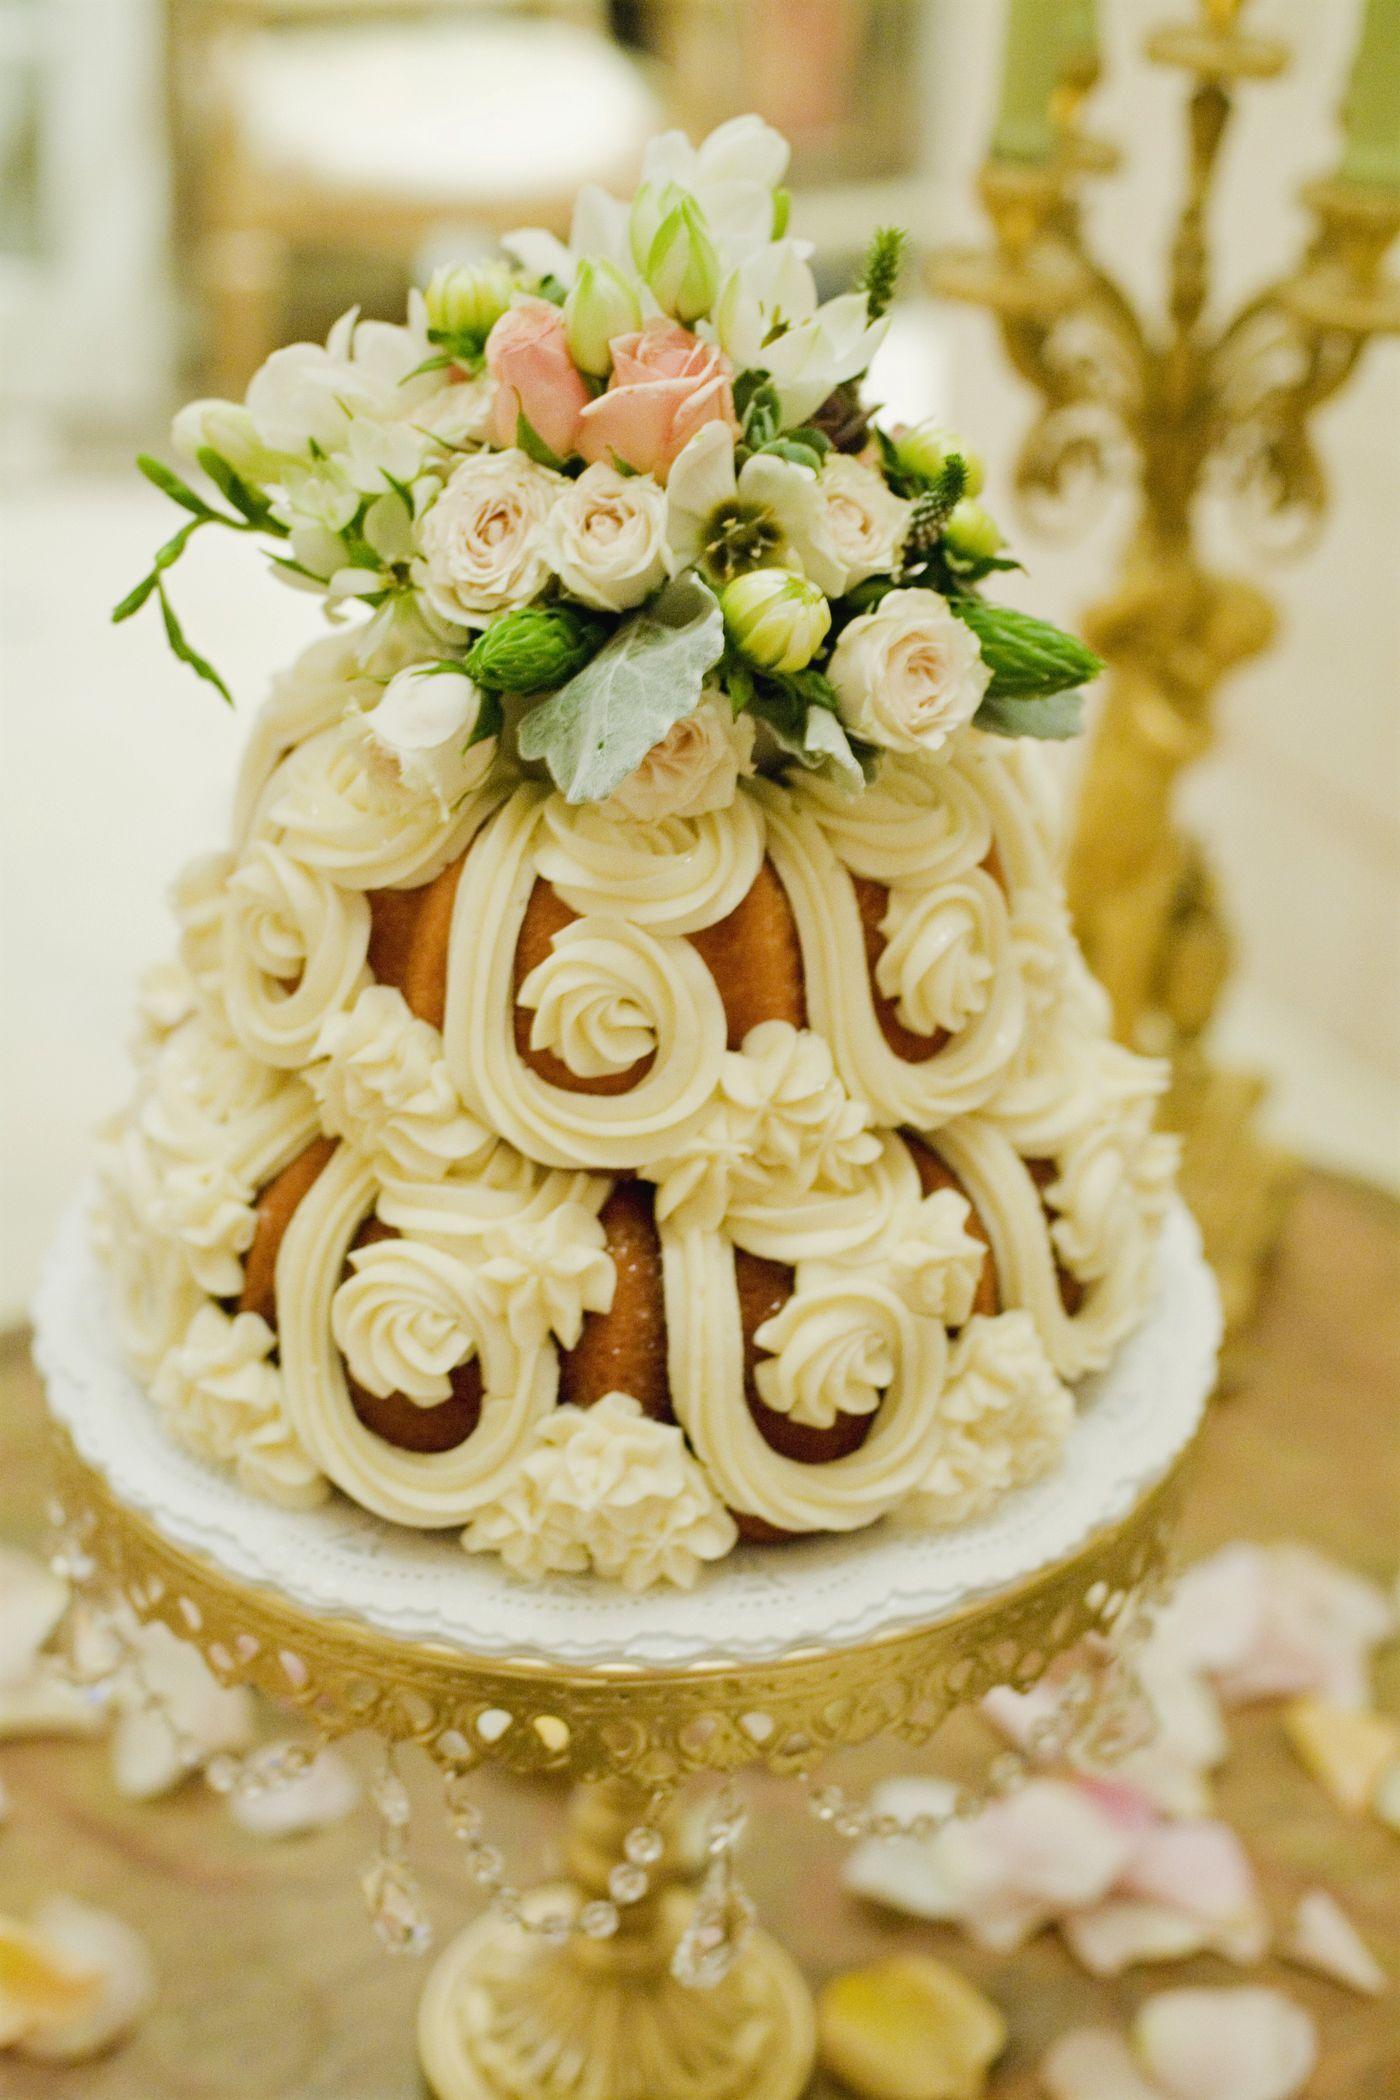 Wedding Bundt cake | Wedding Ideas in 2018 | Pinterest | Cake ...